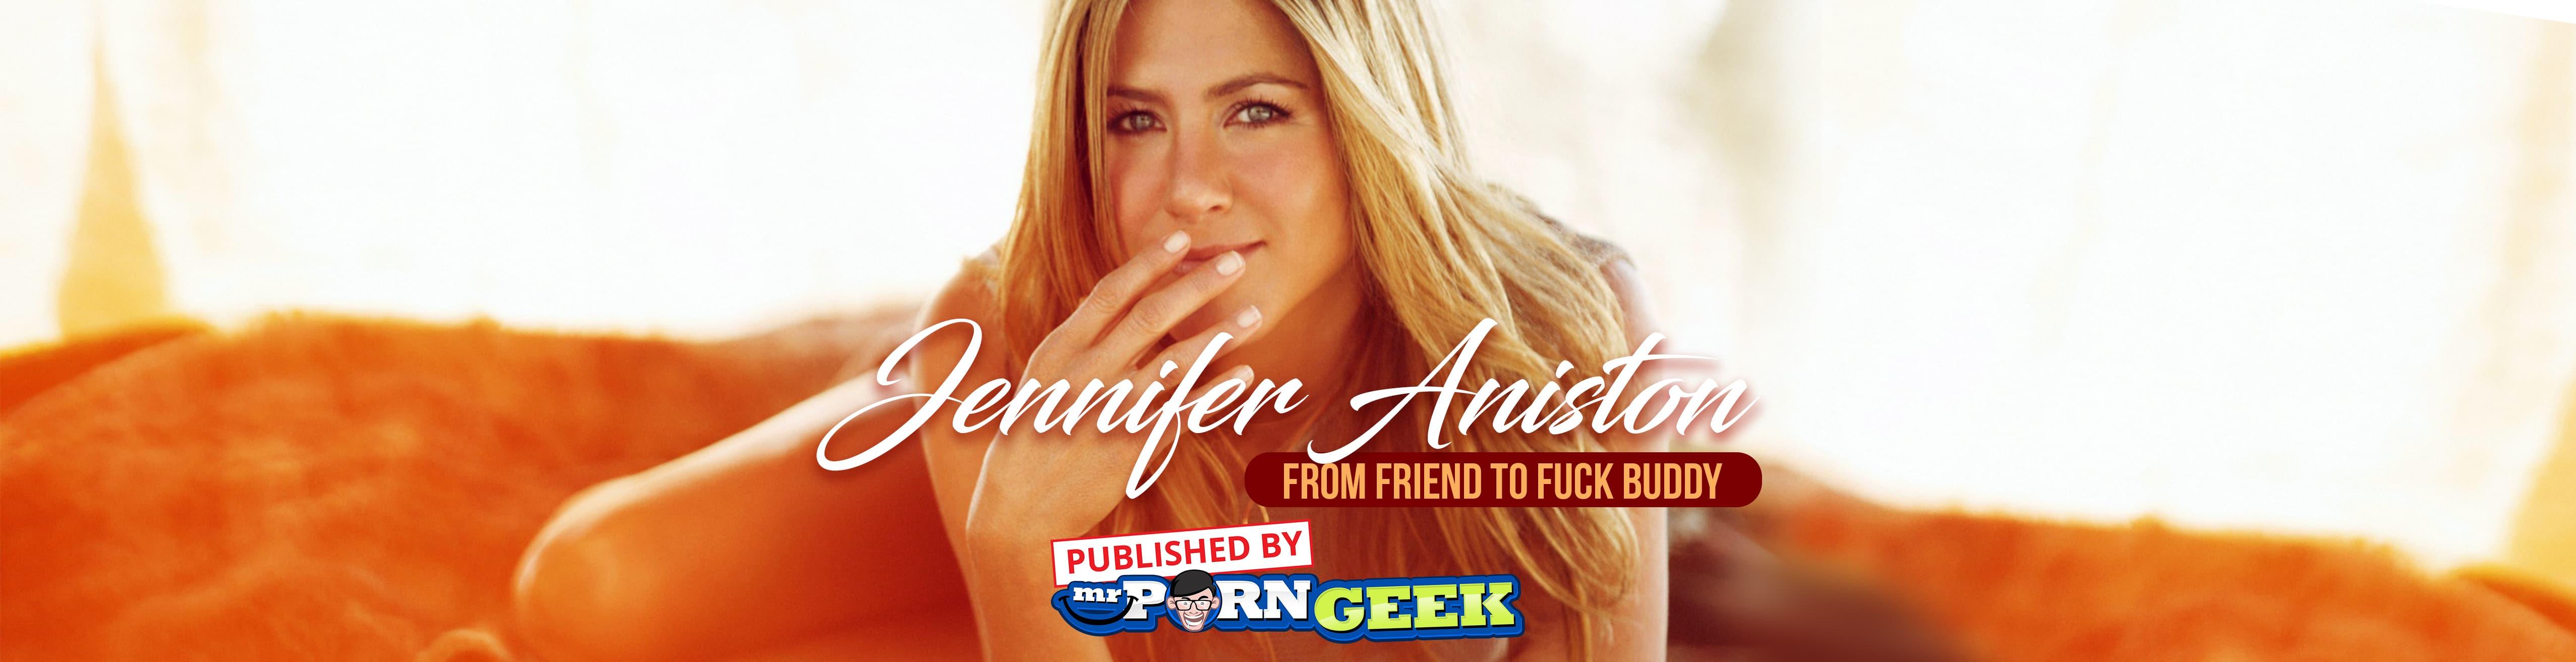 Aniston Porn Jennifer jennifer aniston nude: find splendid jennifer aniston naked